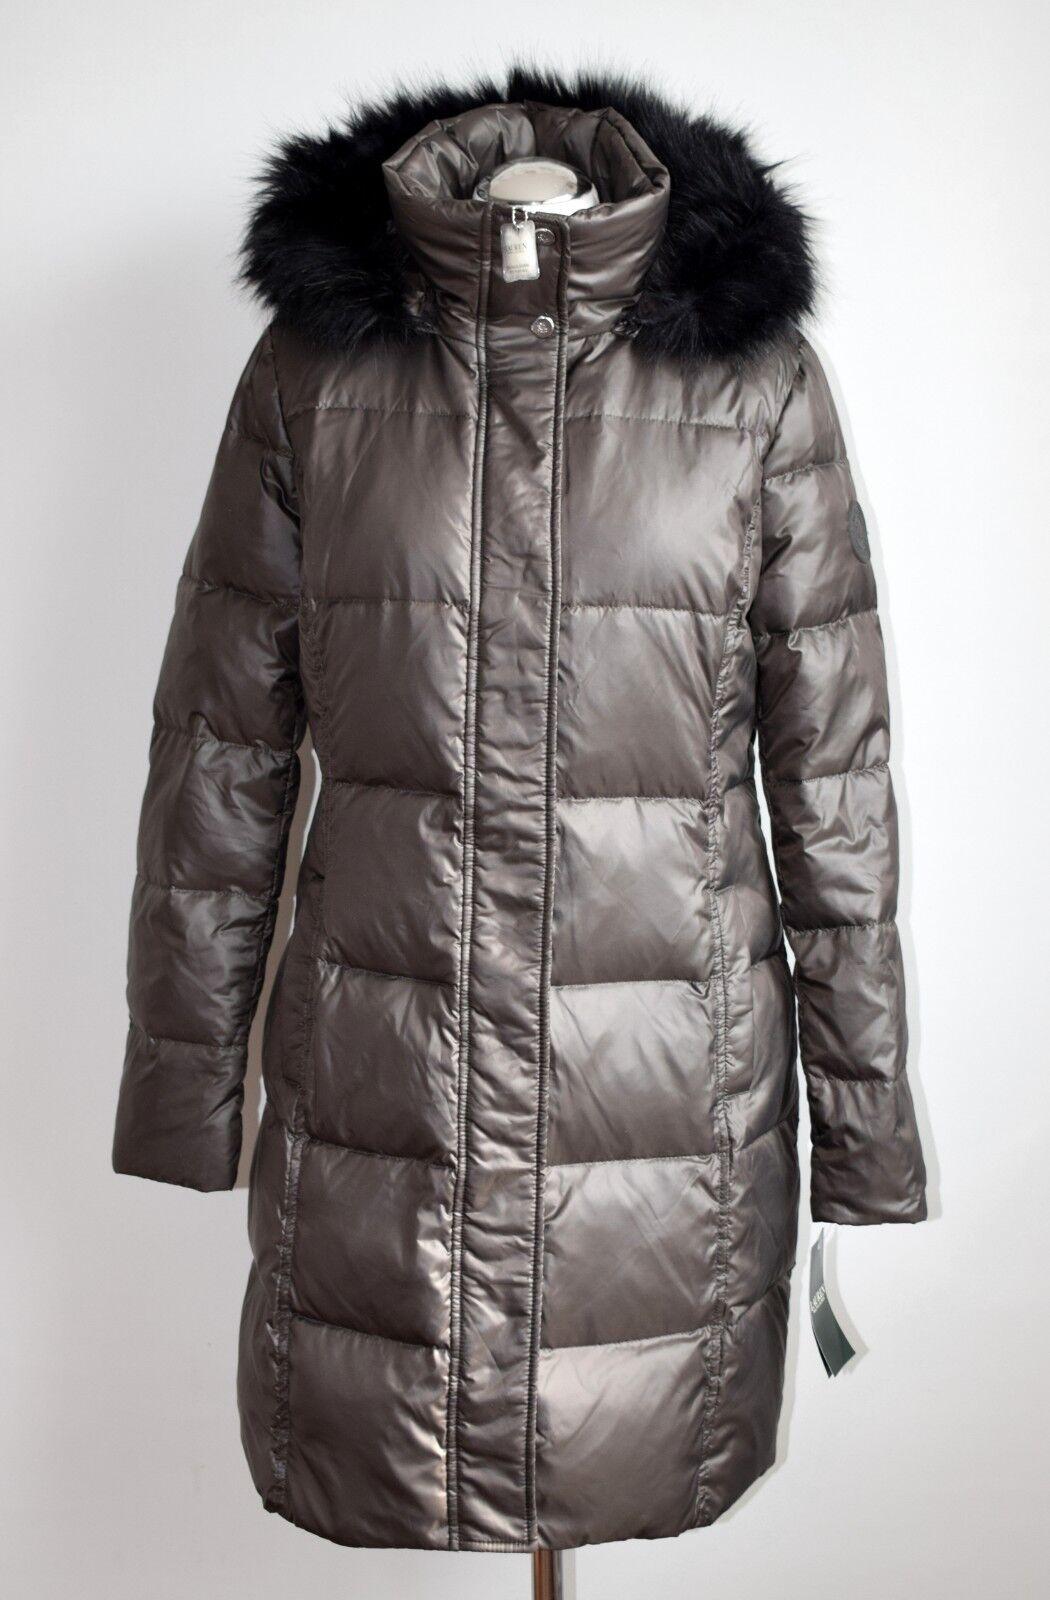 RALPH LAUREN QUILTED COAT - COAT Damen Daunen Mantel Gr. S grau-braun